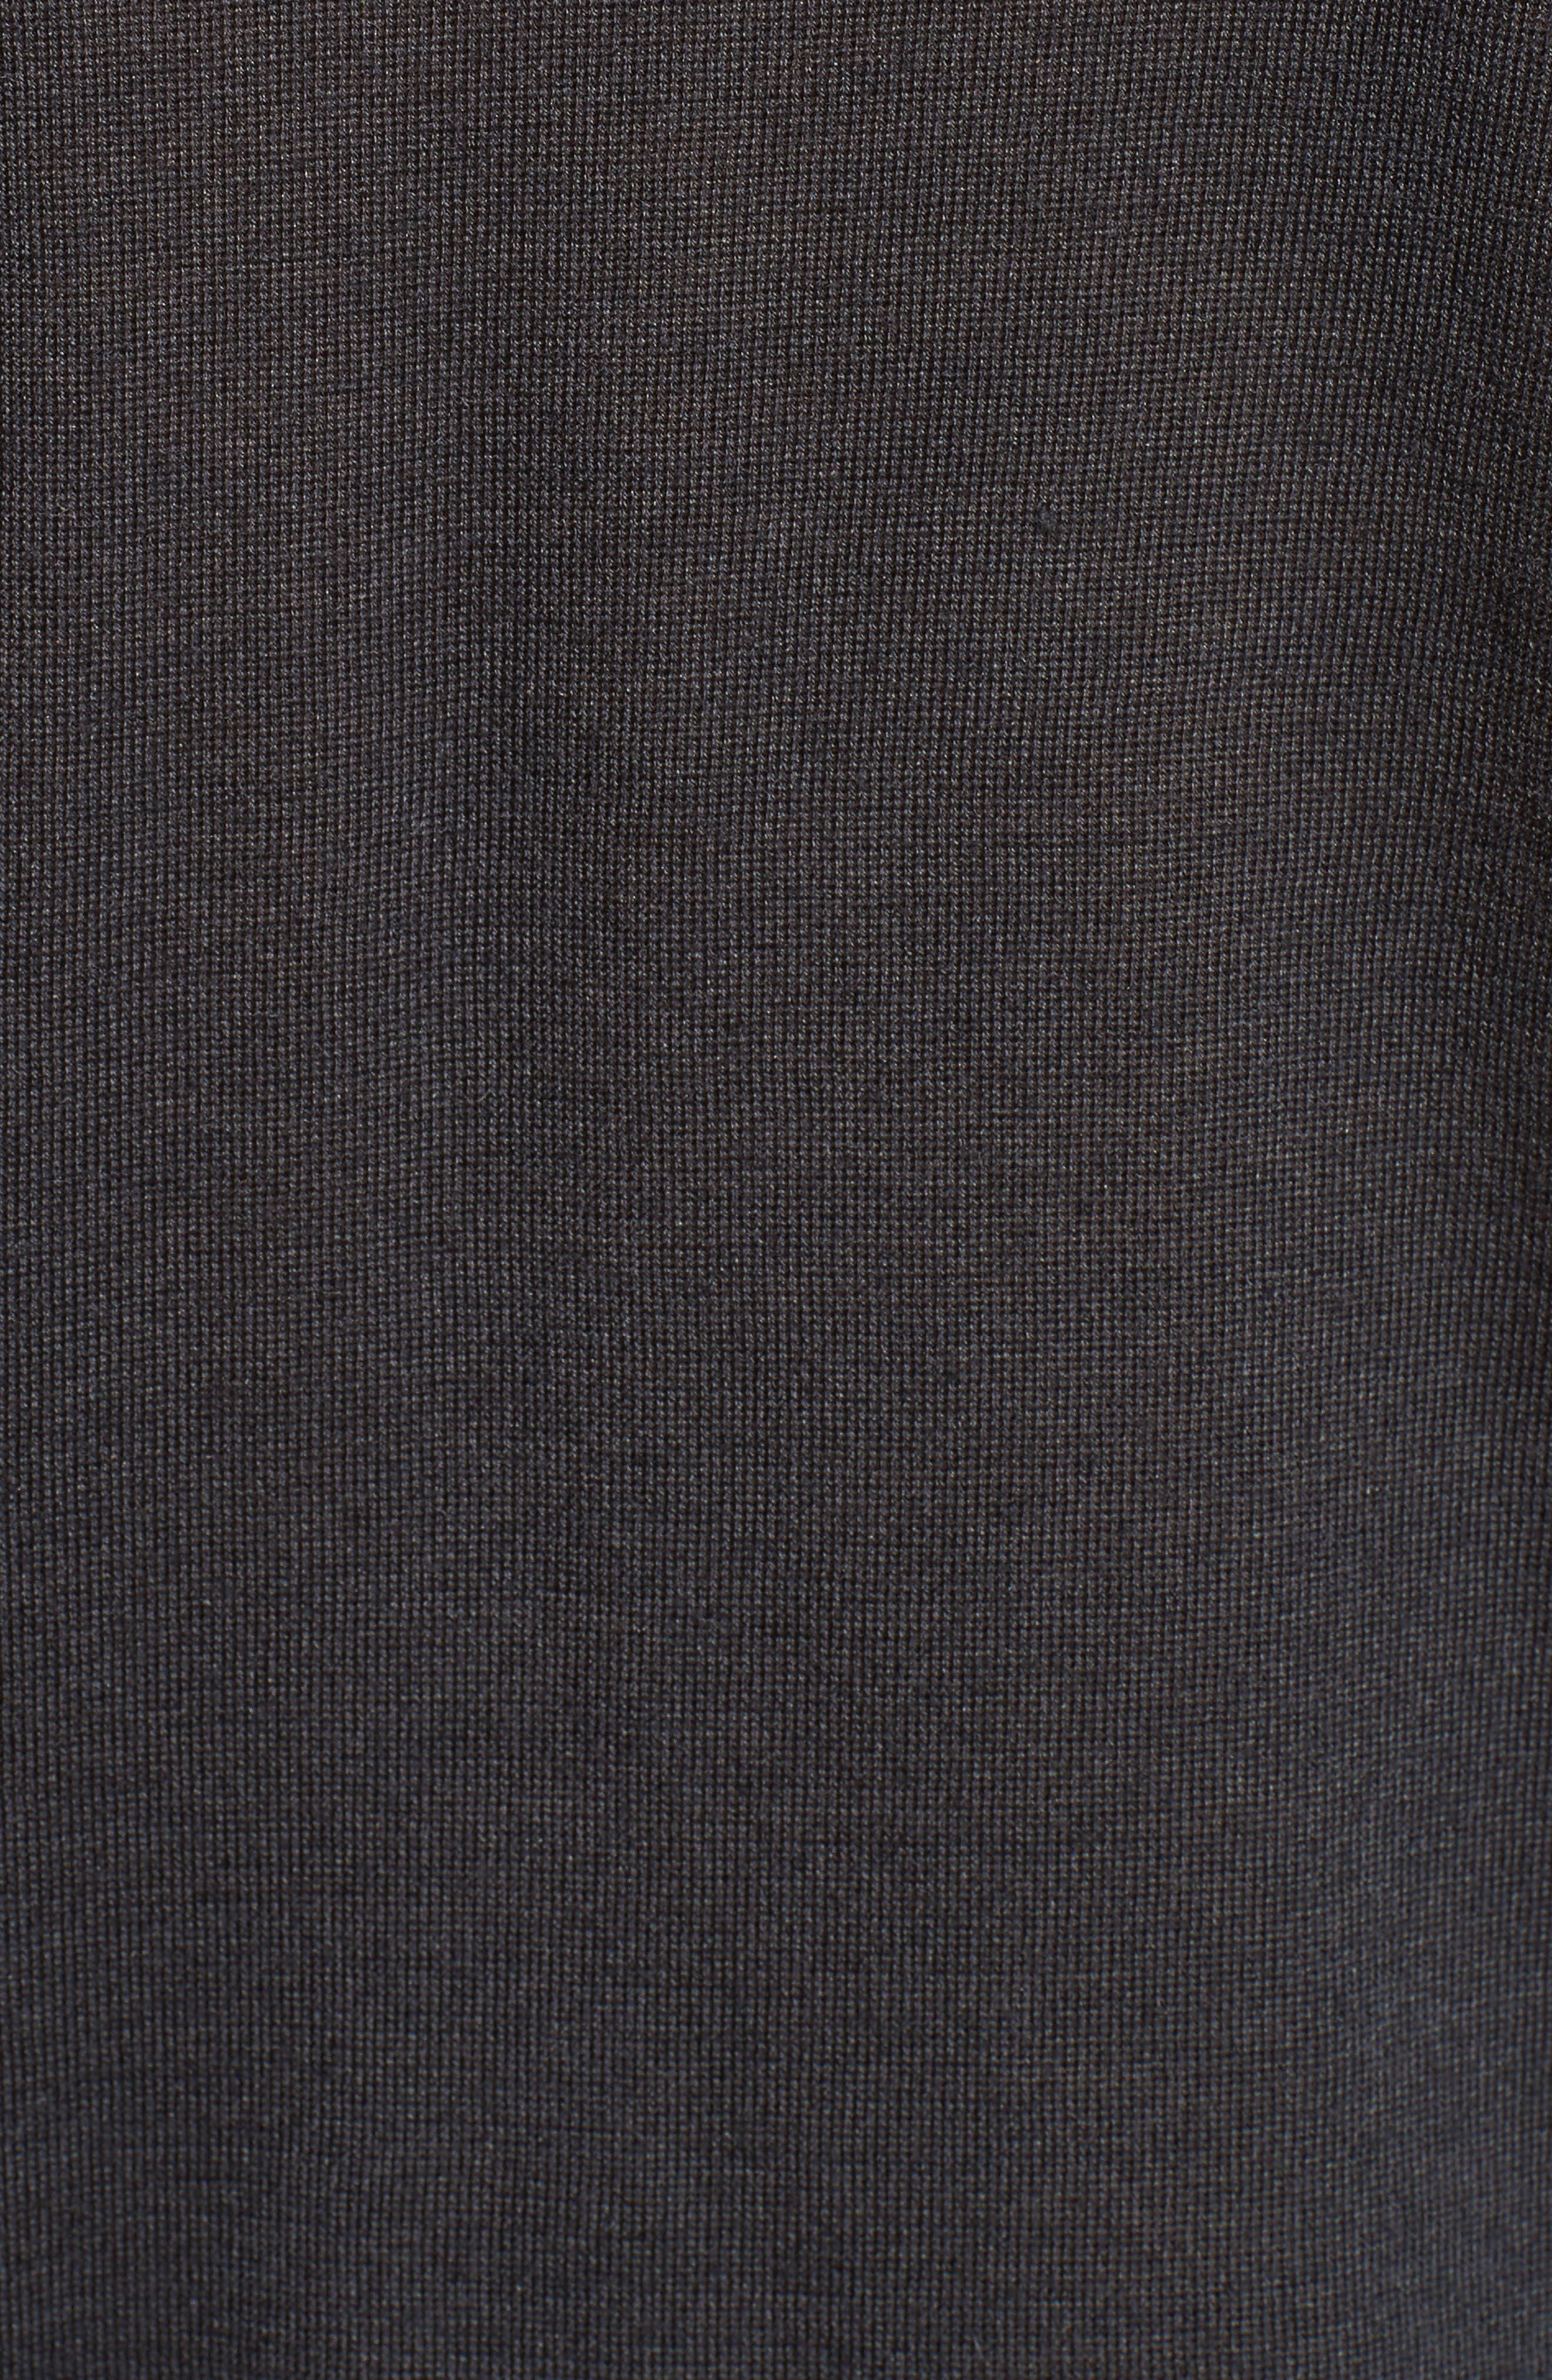 Cashmere & Silk Turtleneck Sweater,                             Alternate thumbnail 5, color,                             021